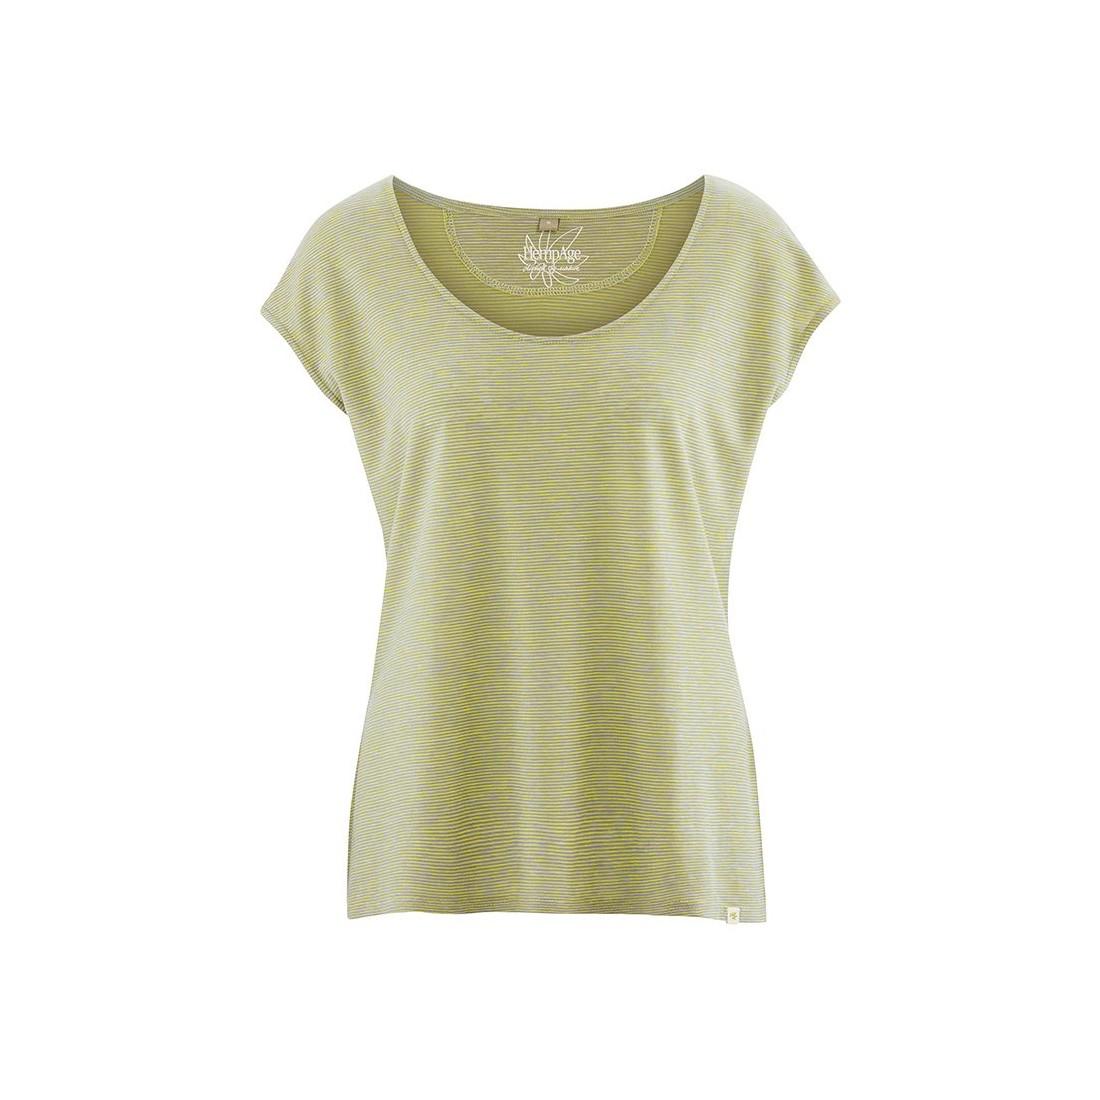 4cb84c0483 Camiseta mujer - cáñamo orgánico de algodón vegano